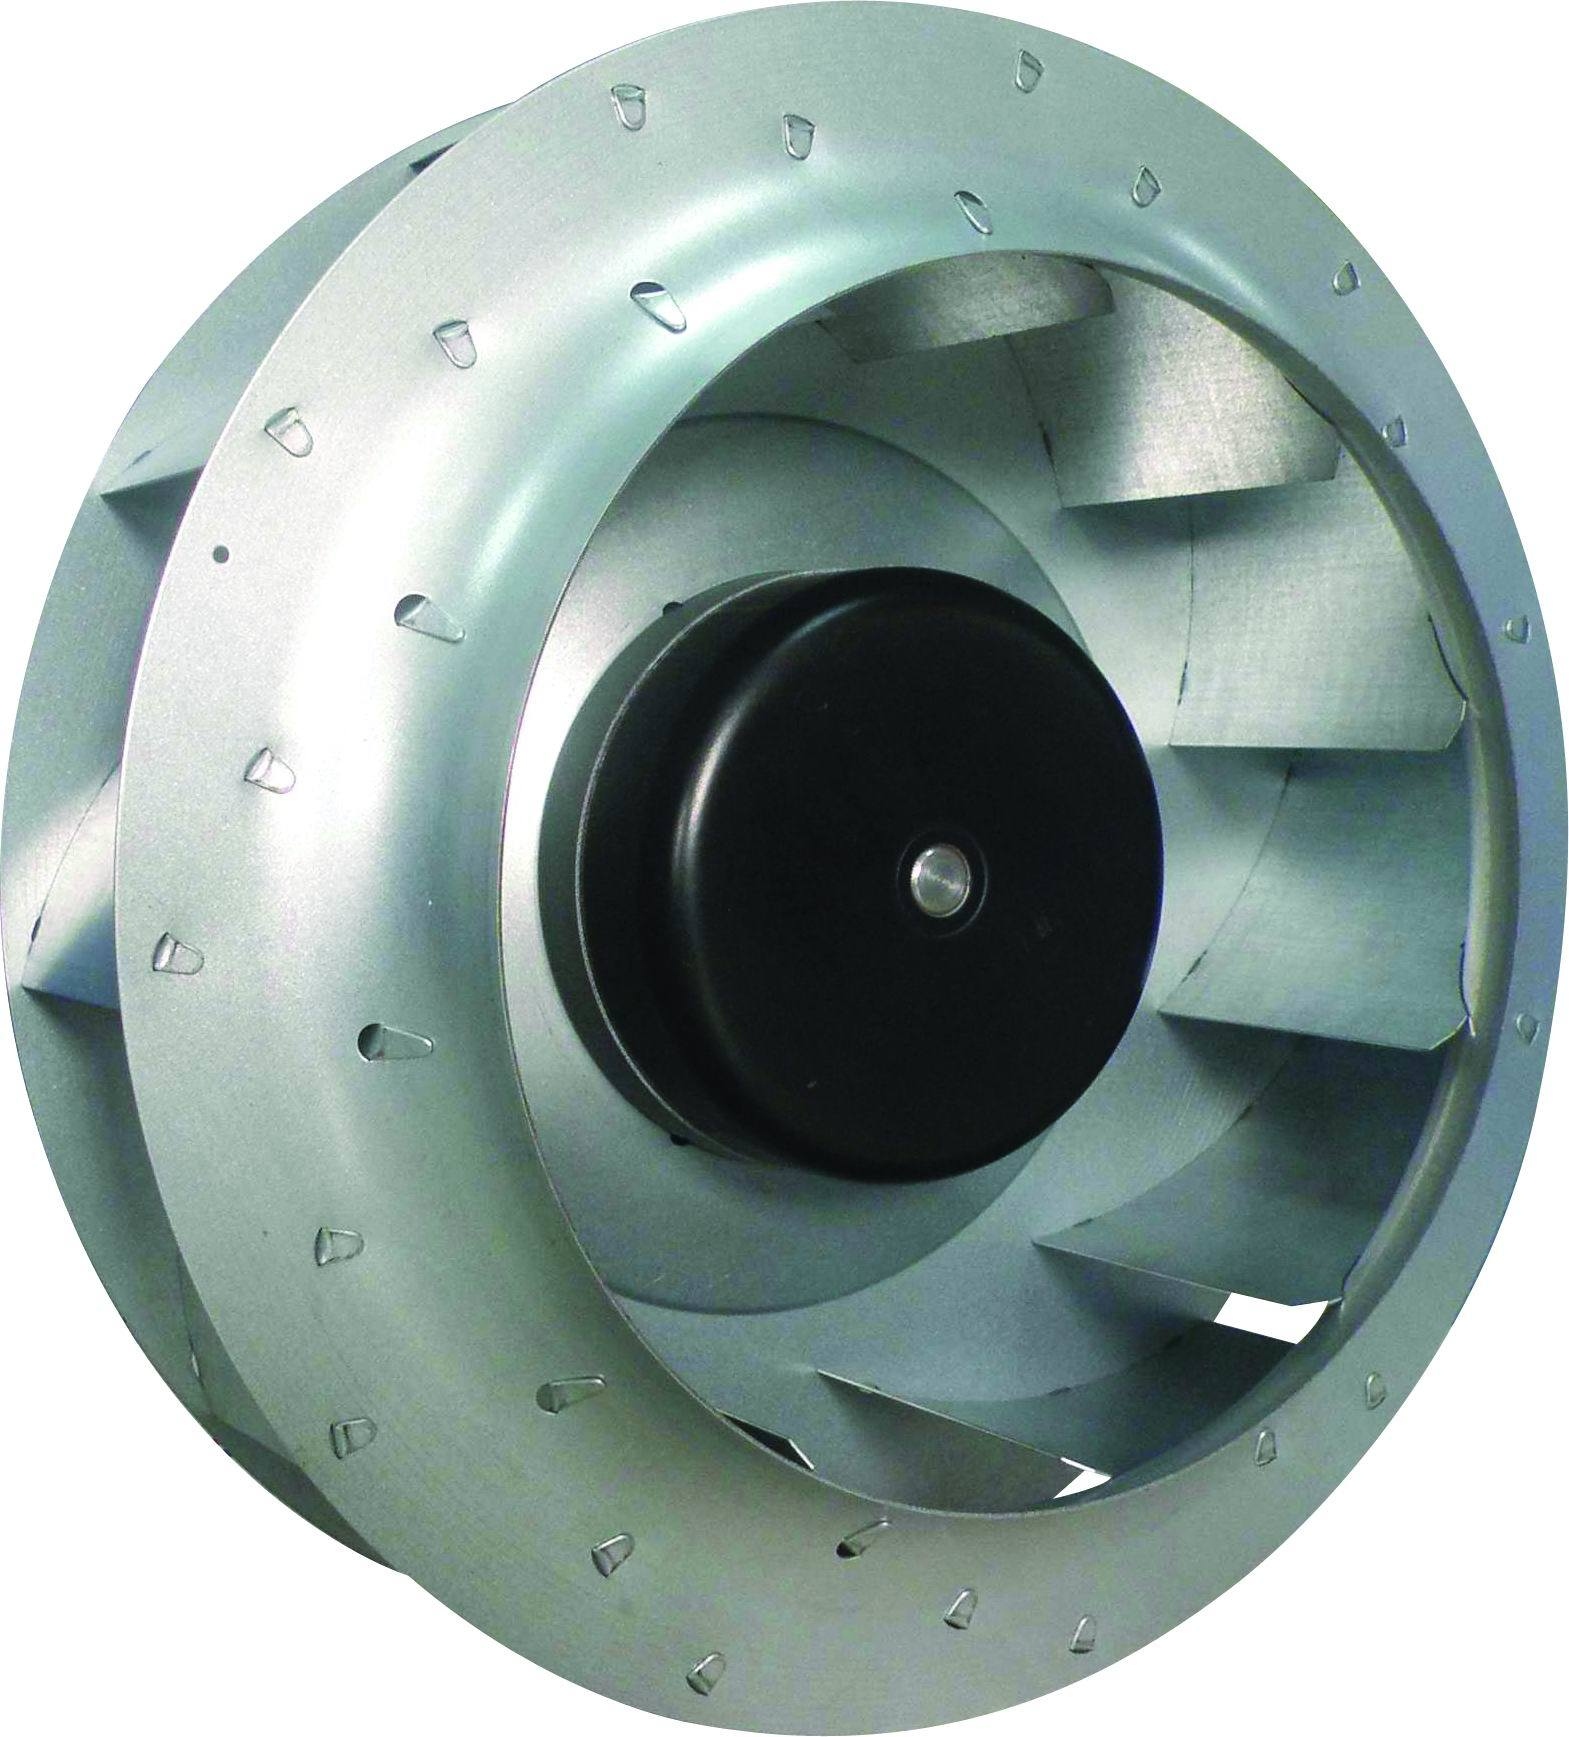 China 250mm Ec Centrifugal Fan China Fan Centrifugal Fan #3C505B